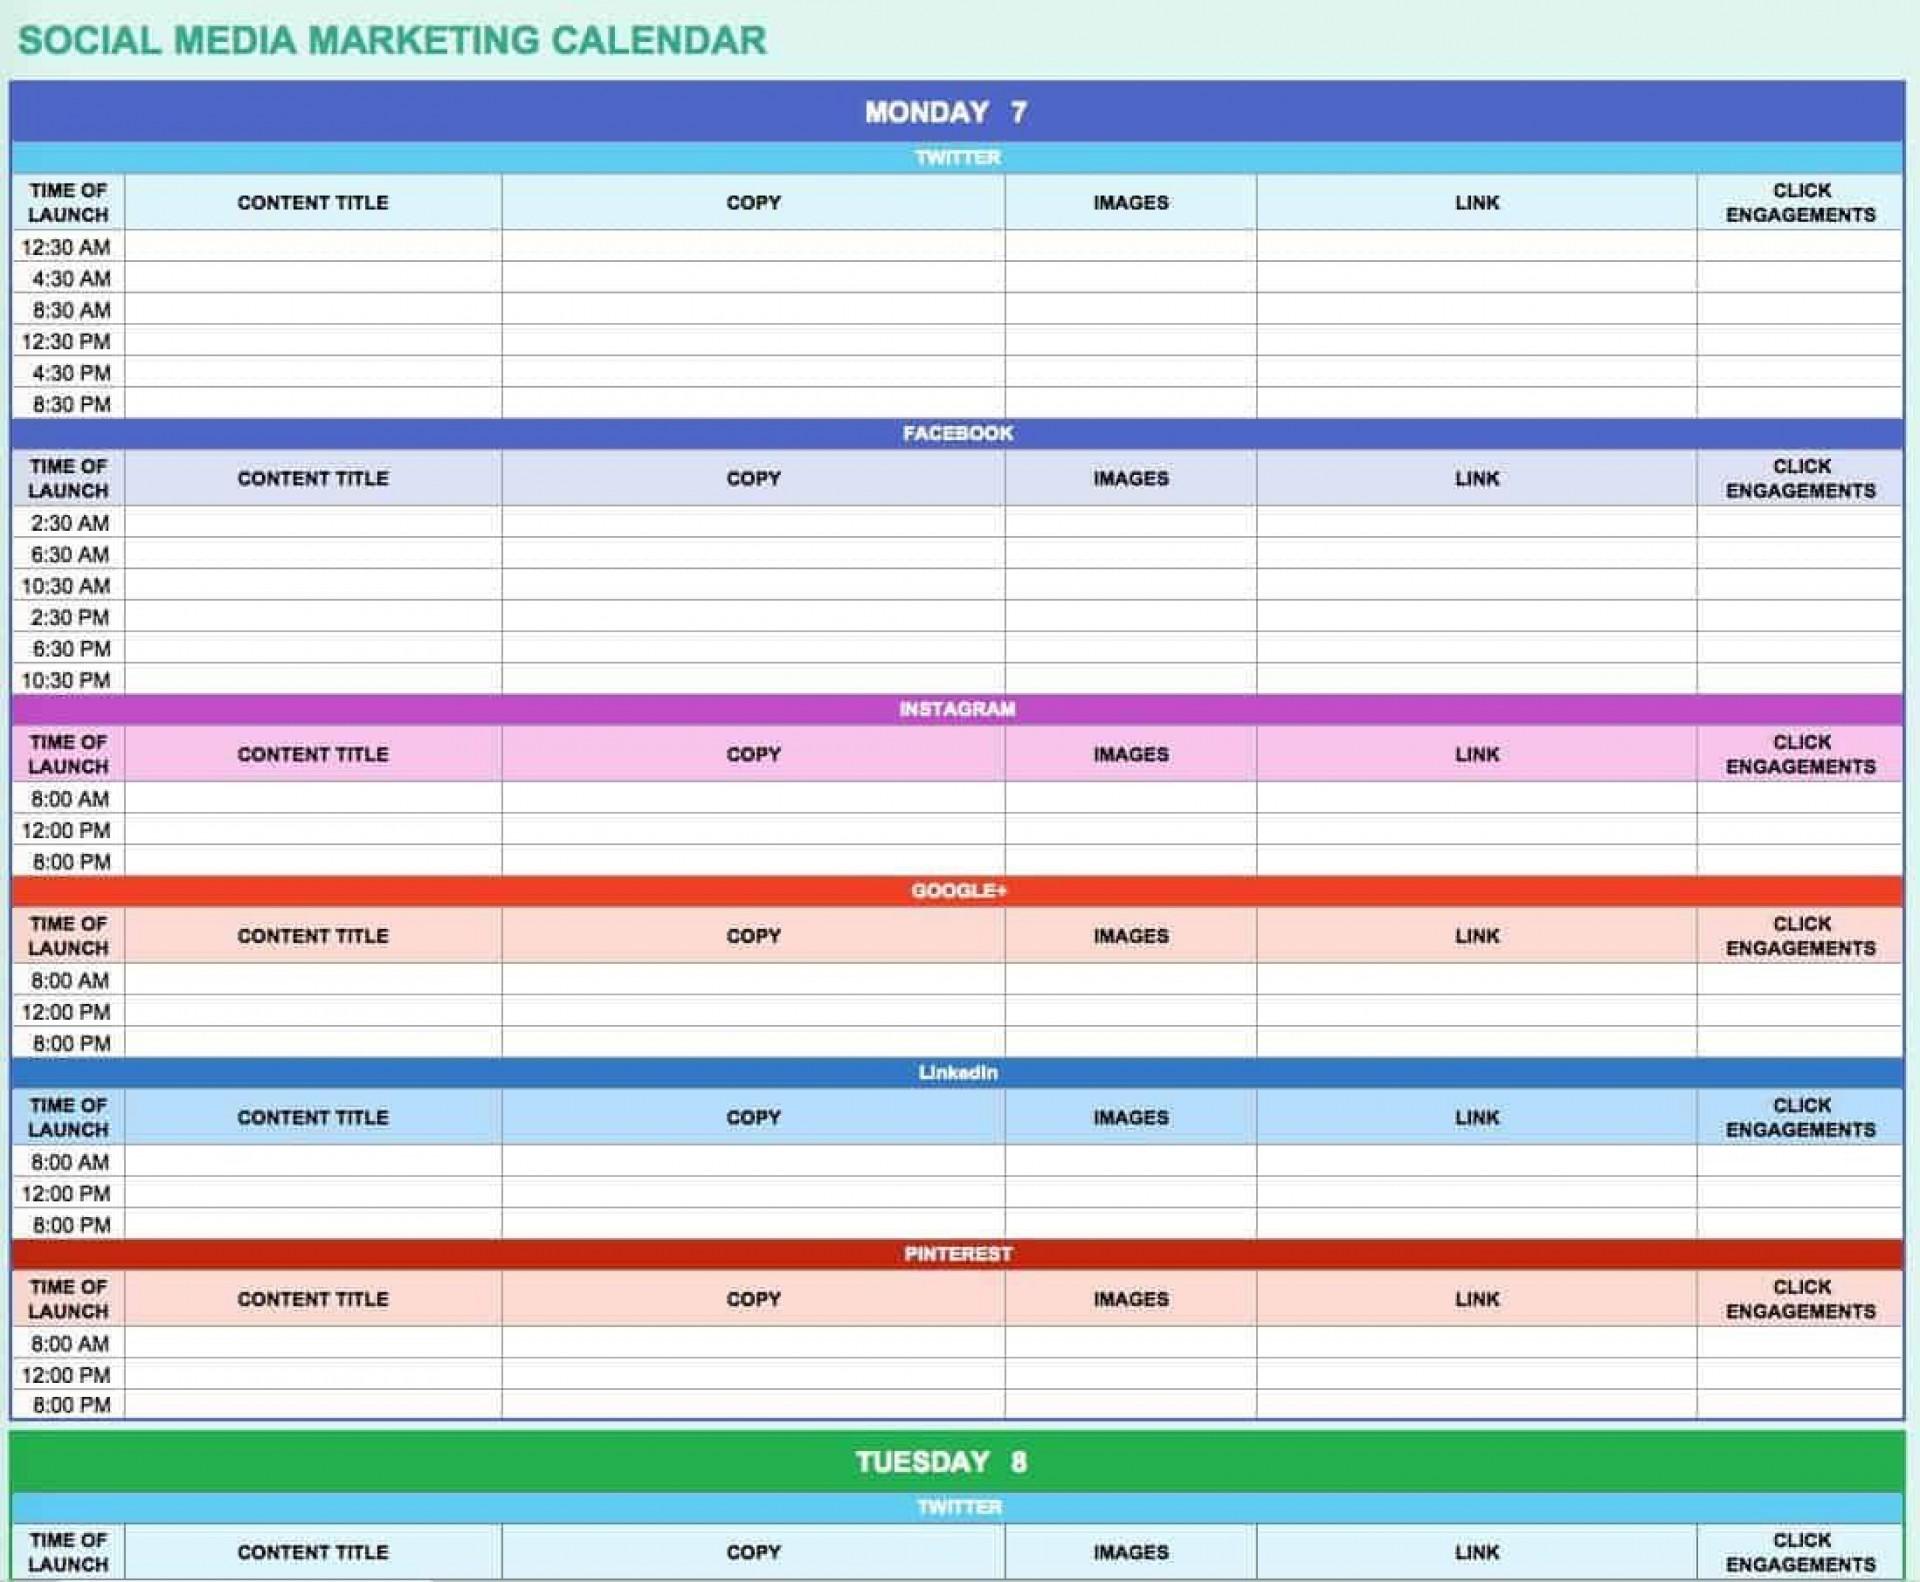 005 Amazing Social Media Editorial Calendar Template Example  Templates Content 2019 Planning 20201920